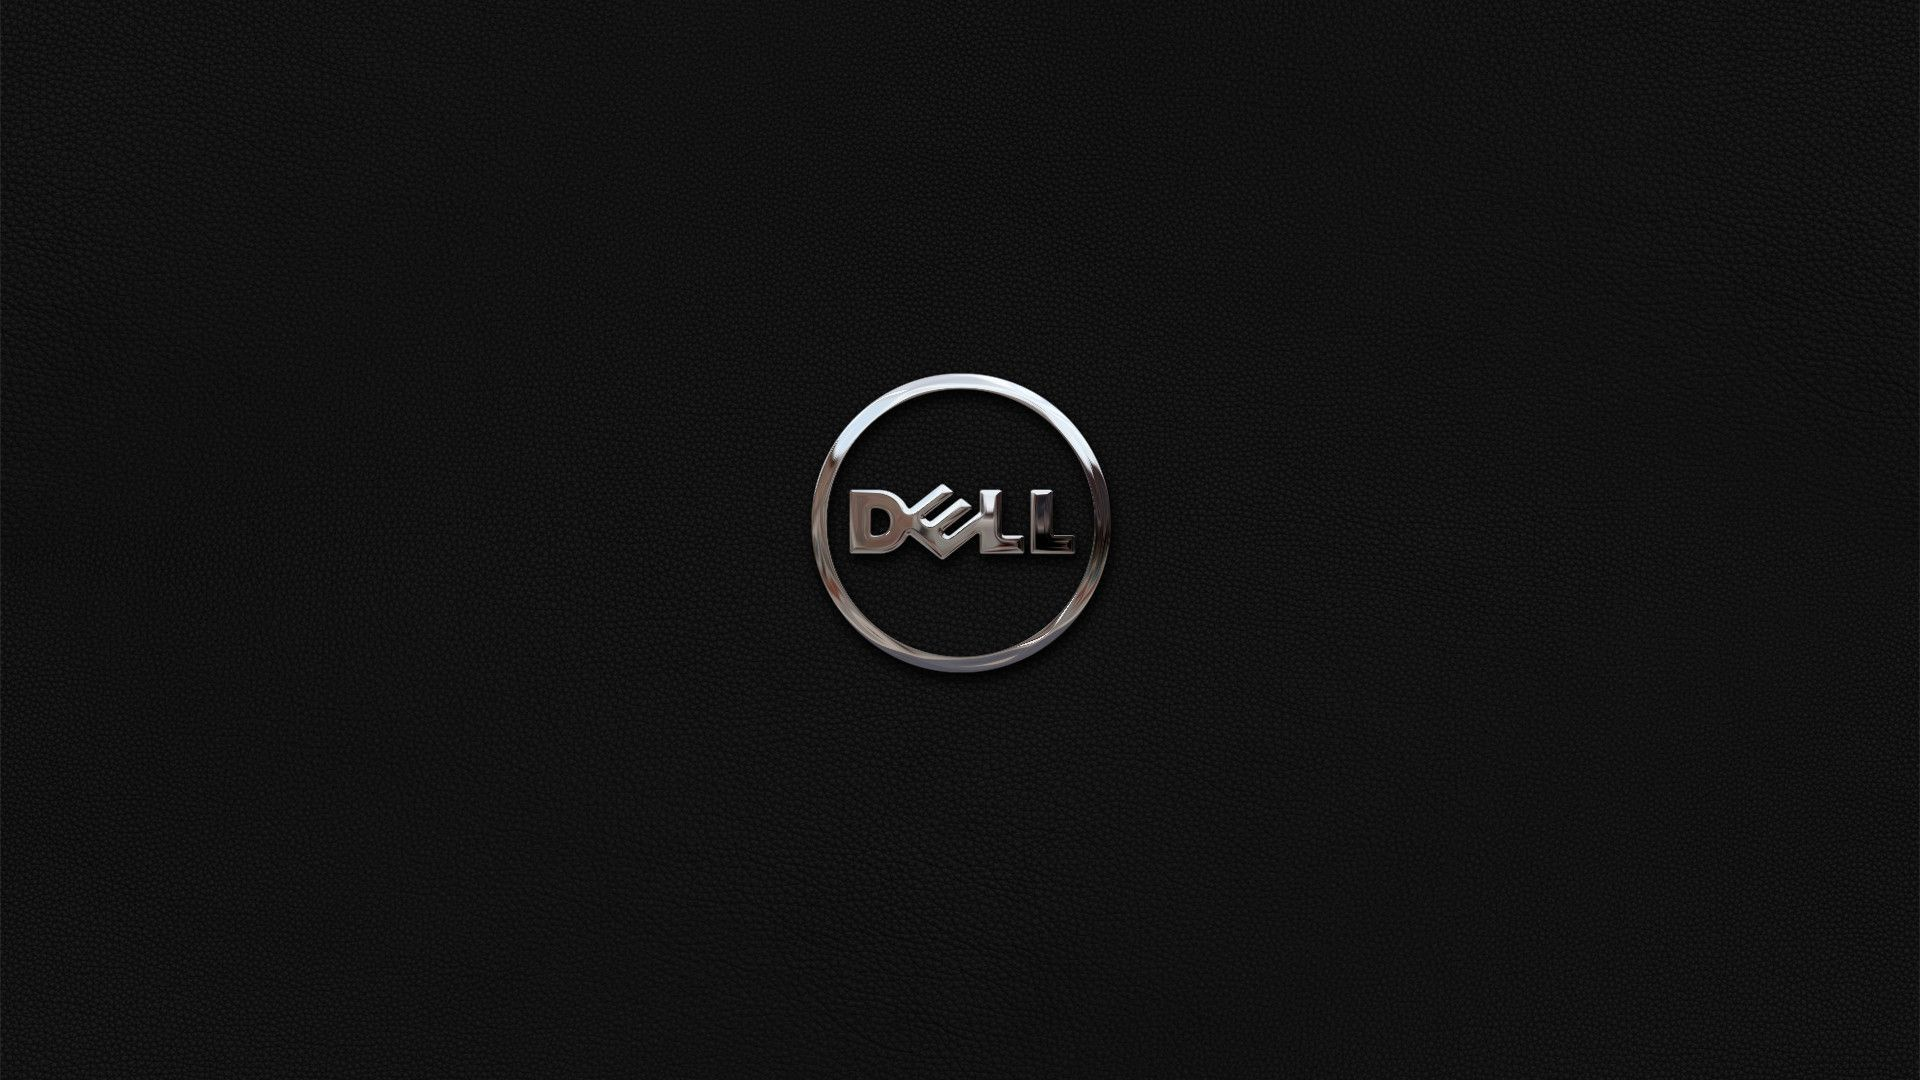 Dell Wallpaper 4k In 2020 Wallpaper Gaming Wallpapers Desktop Wallpaper